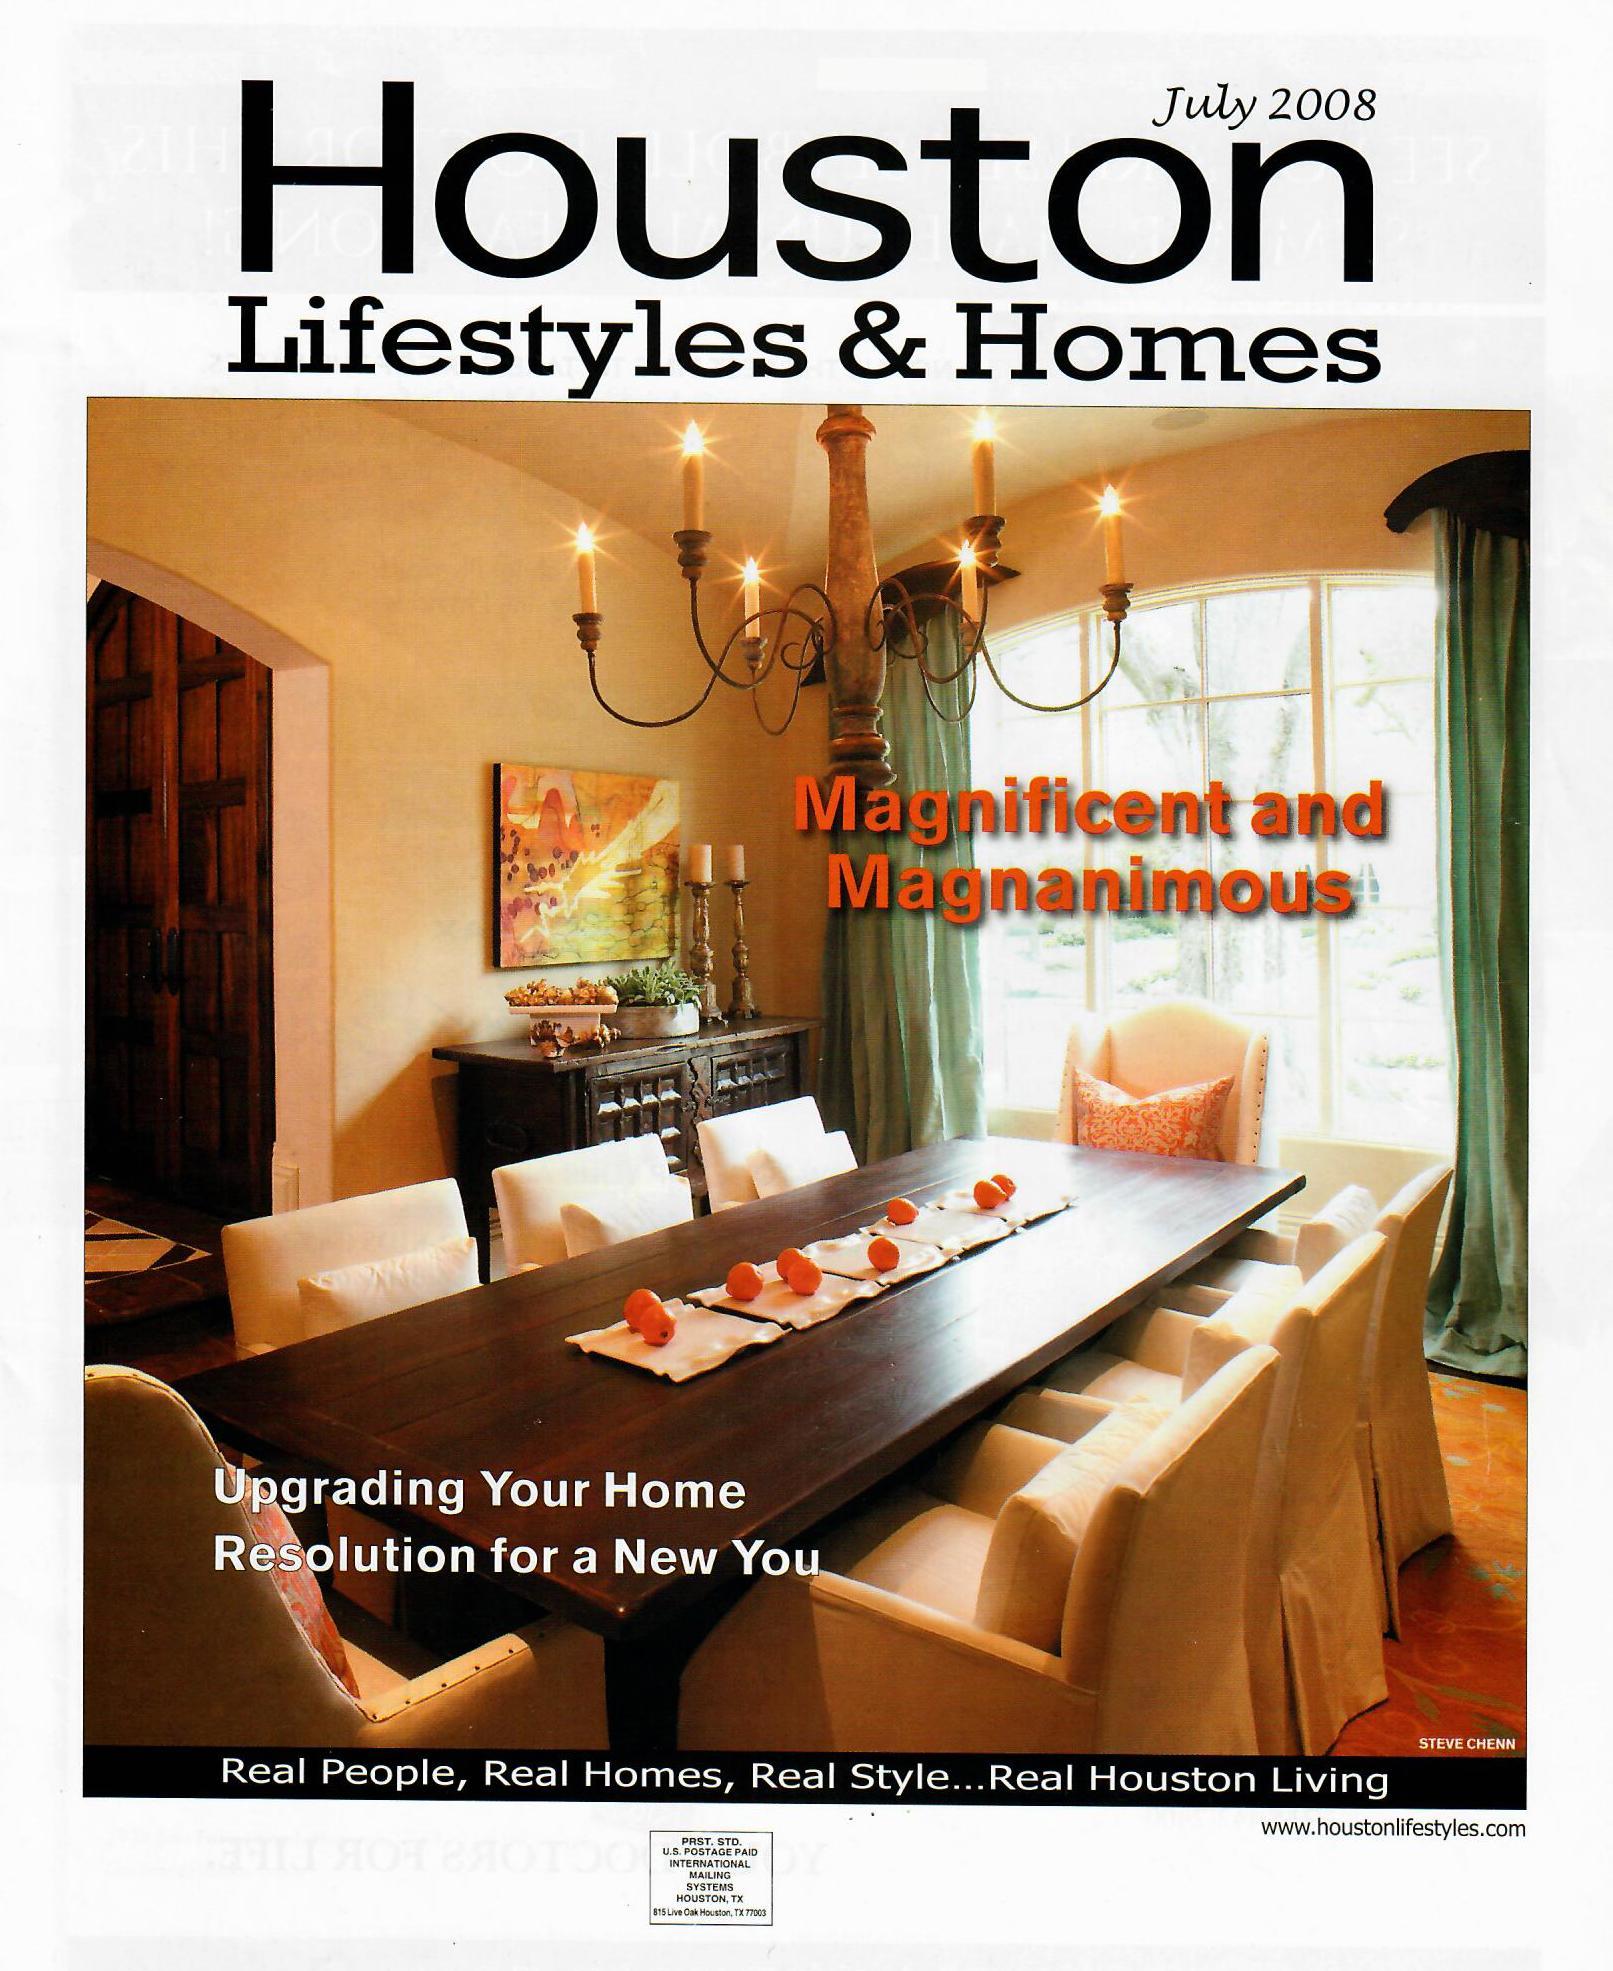 houston lifestyle magazine.jpg